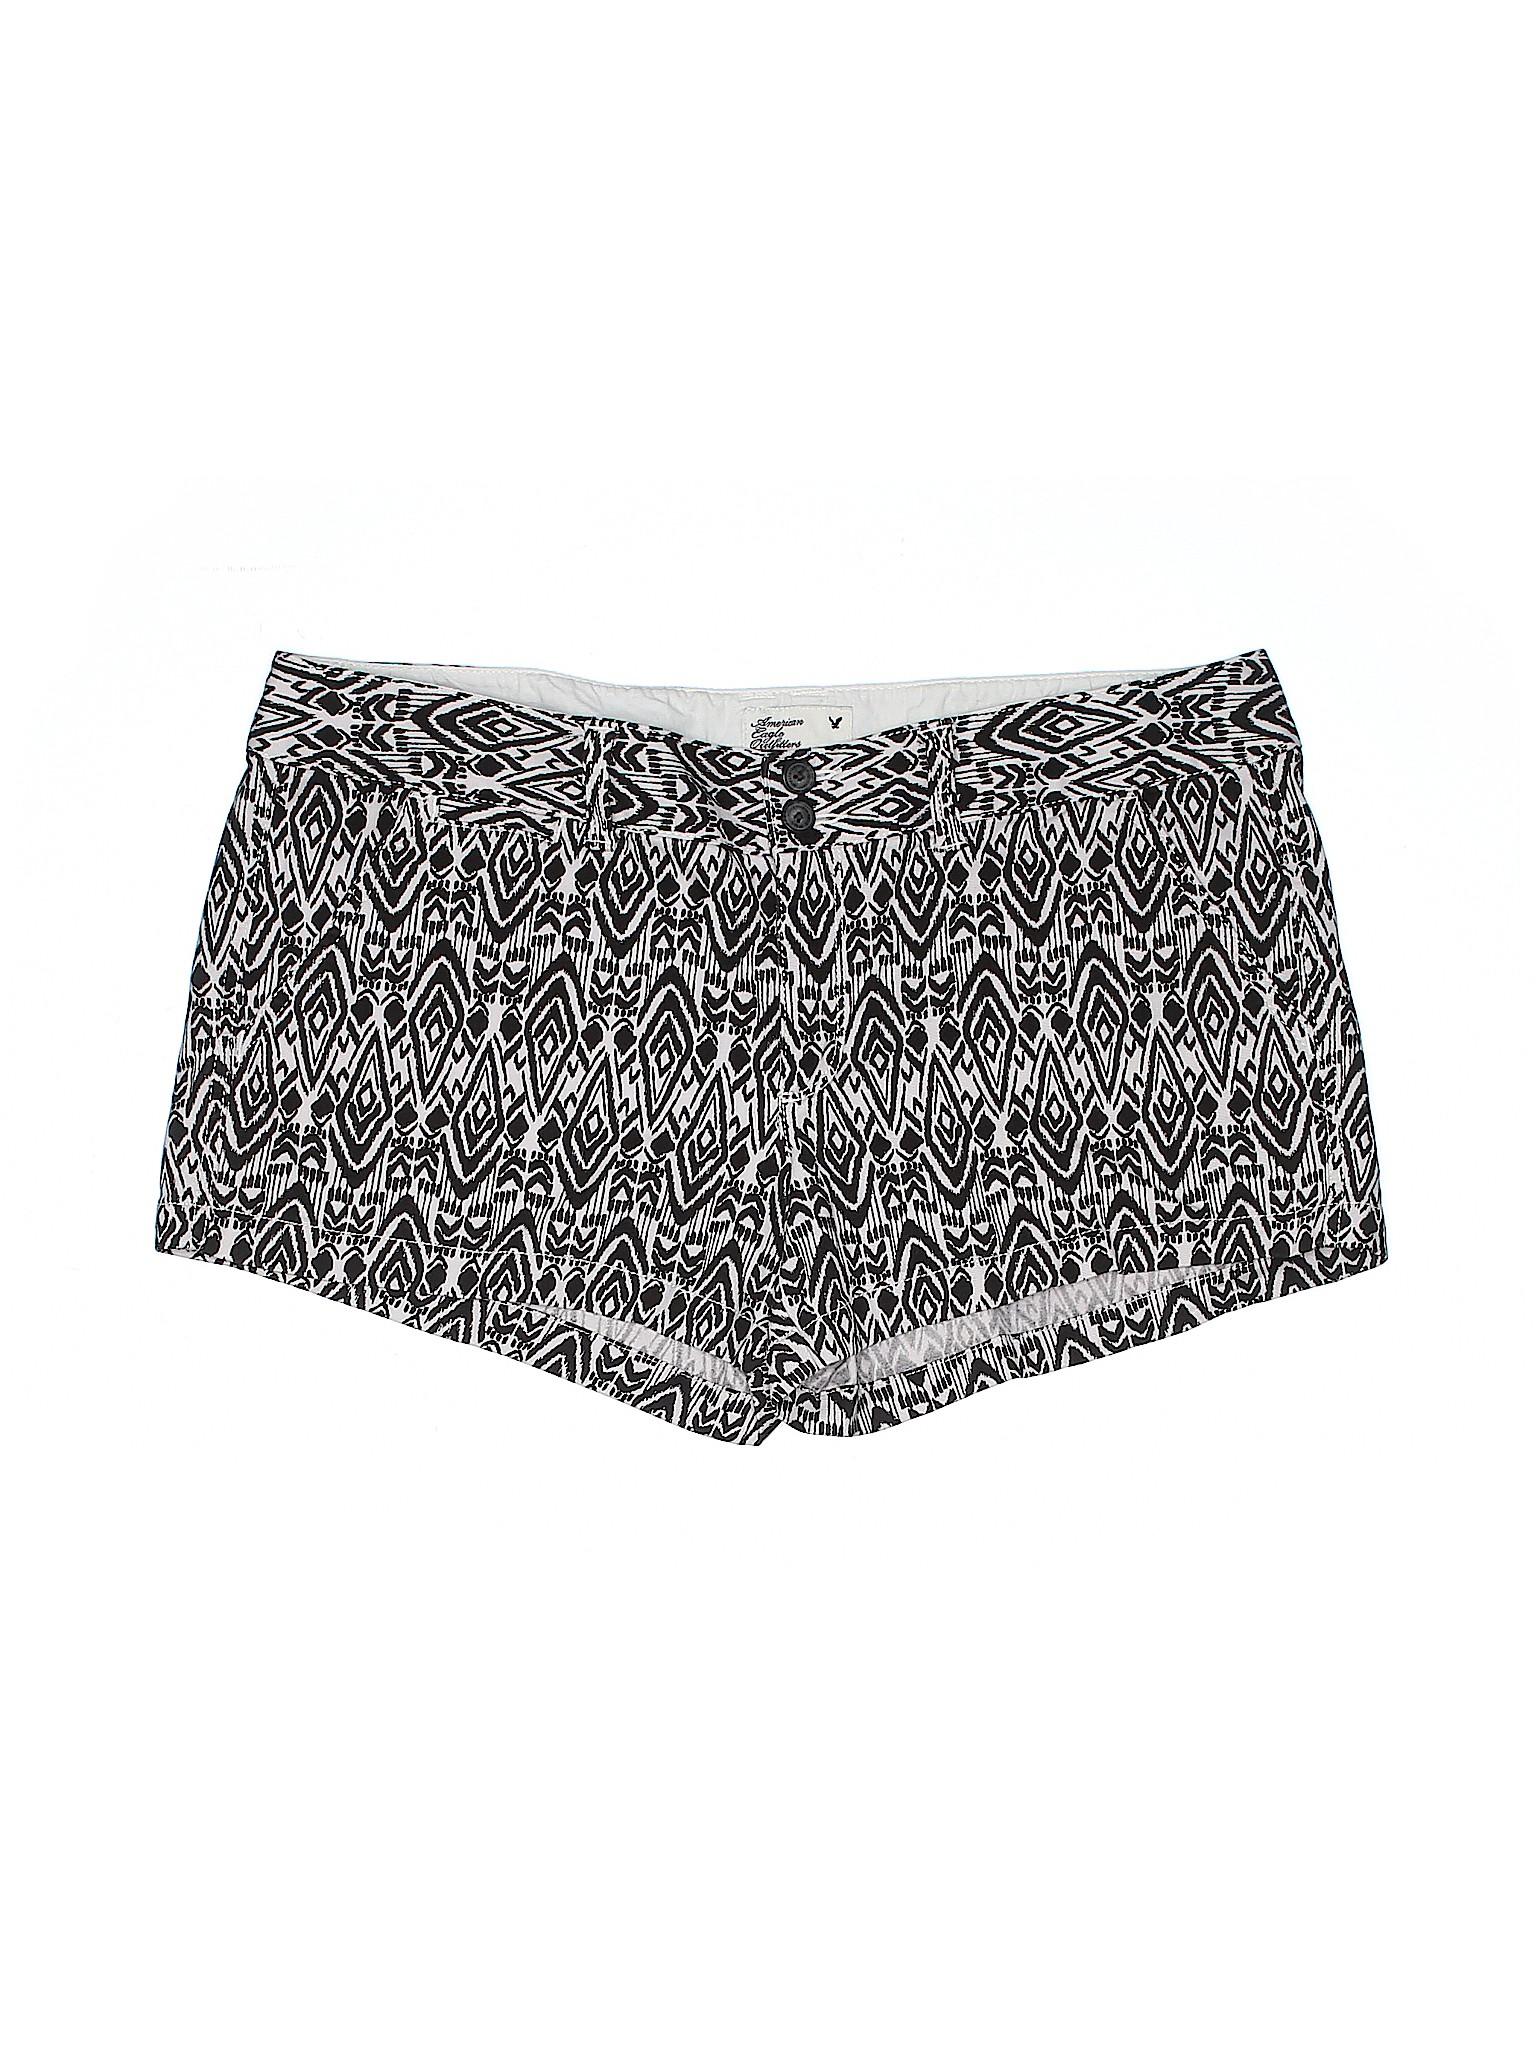 Khaki Outfitters Shorts Boutique American Eagle qEnBgt